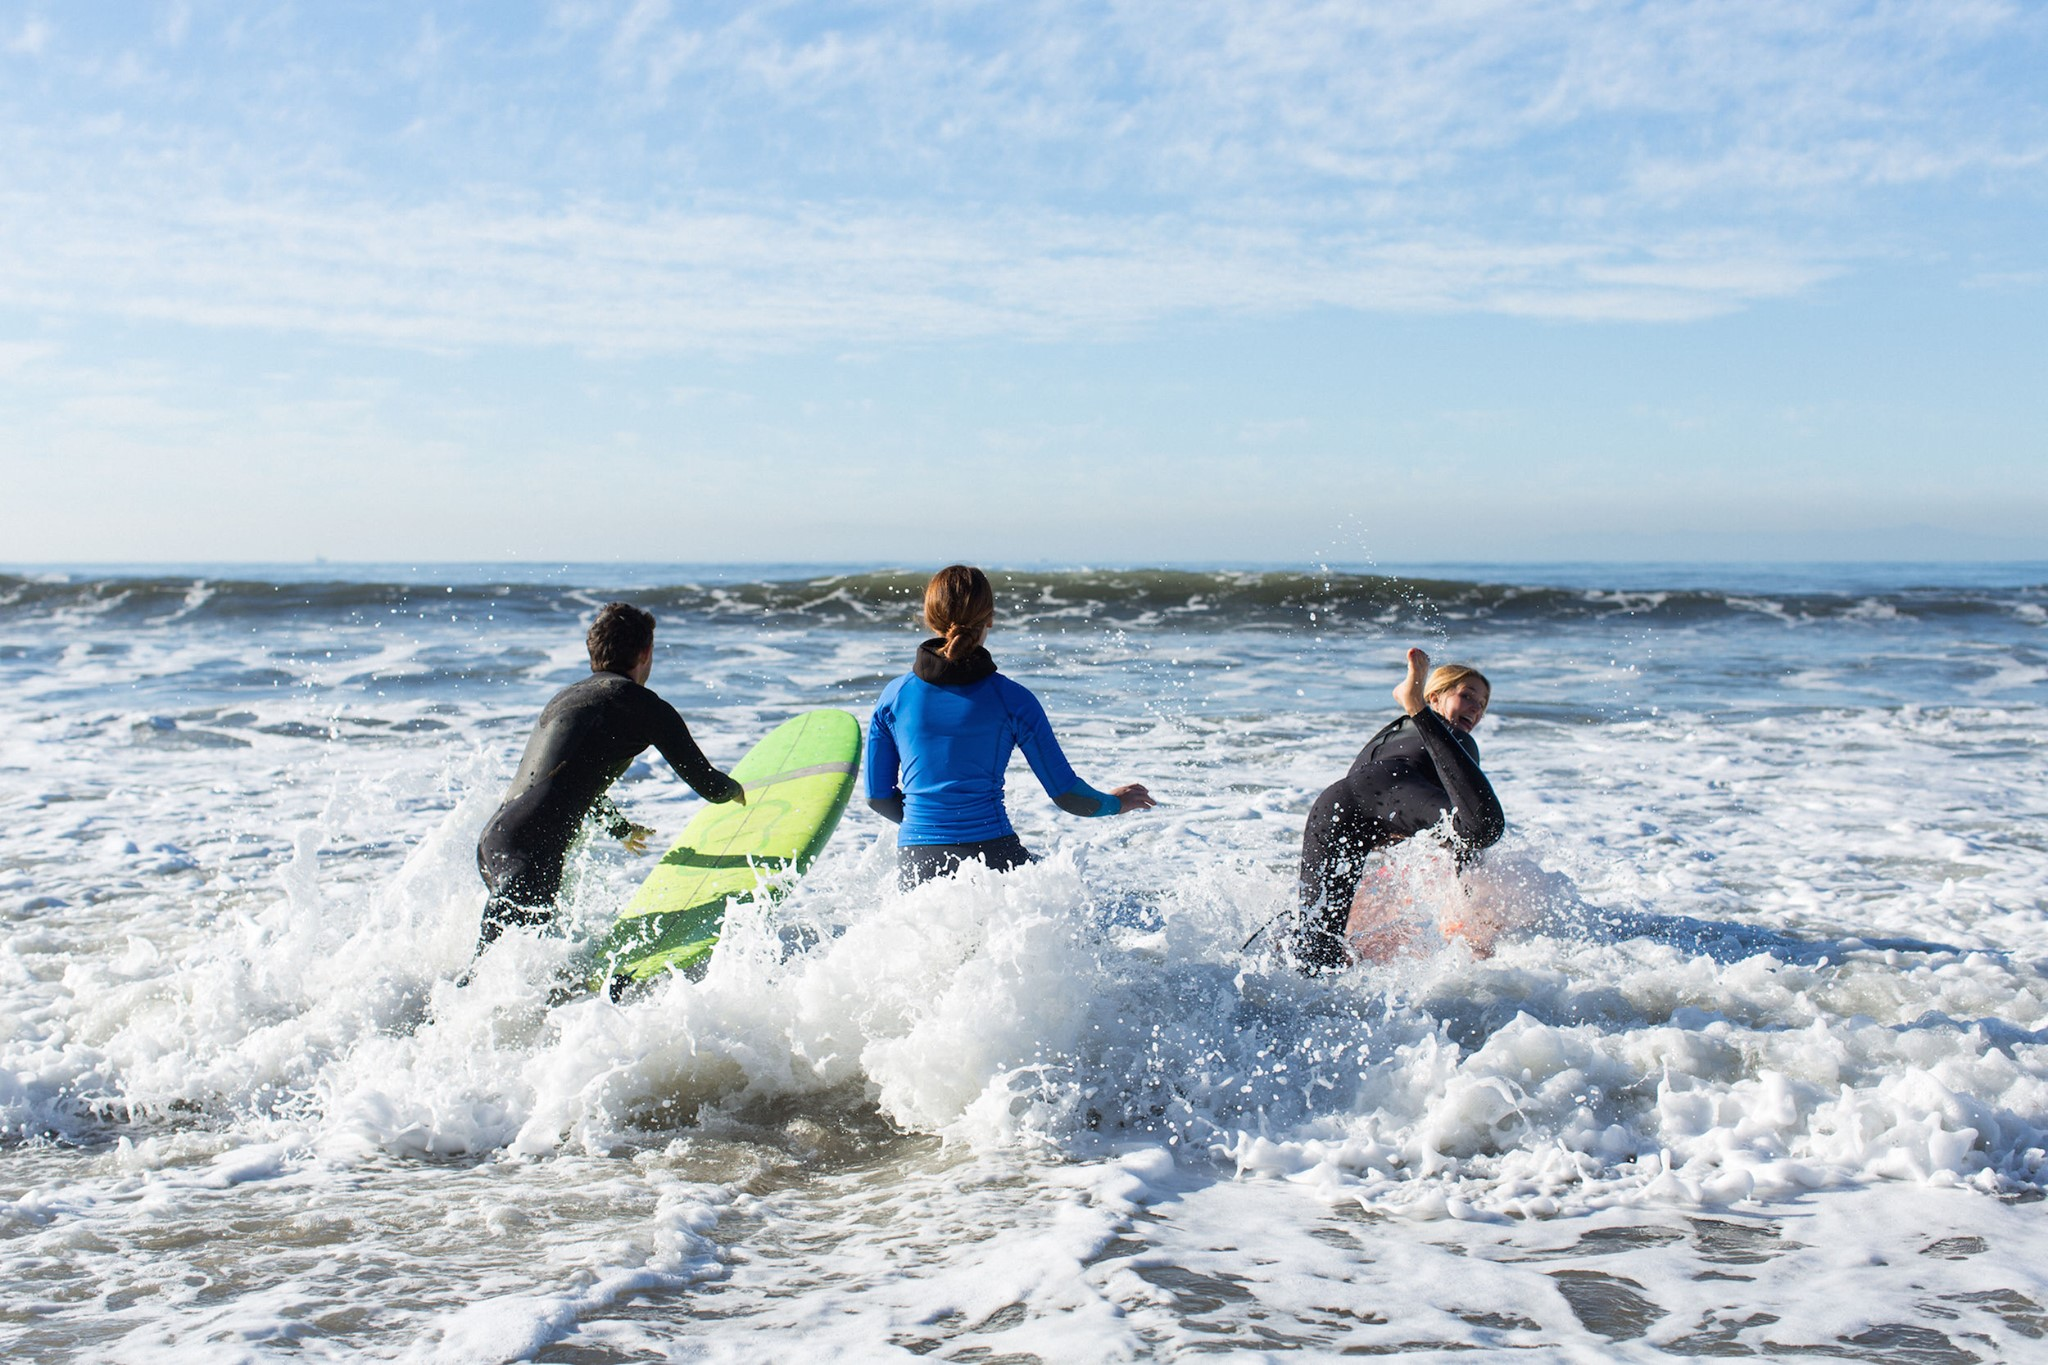 Learning to Surf in Santa Barbara